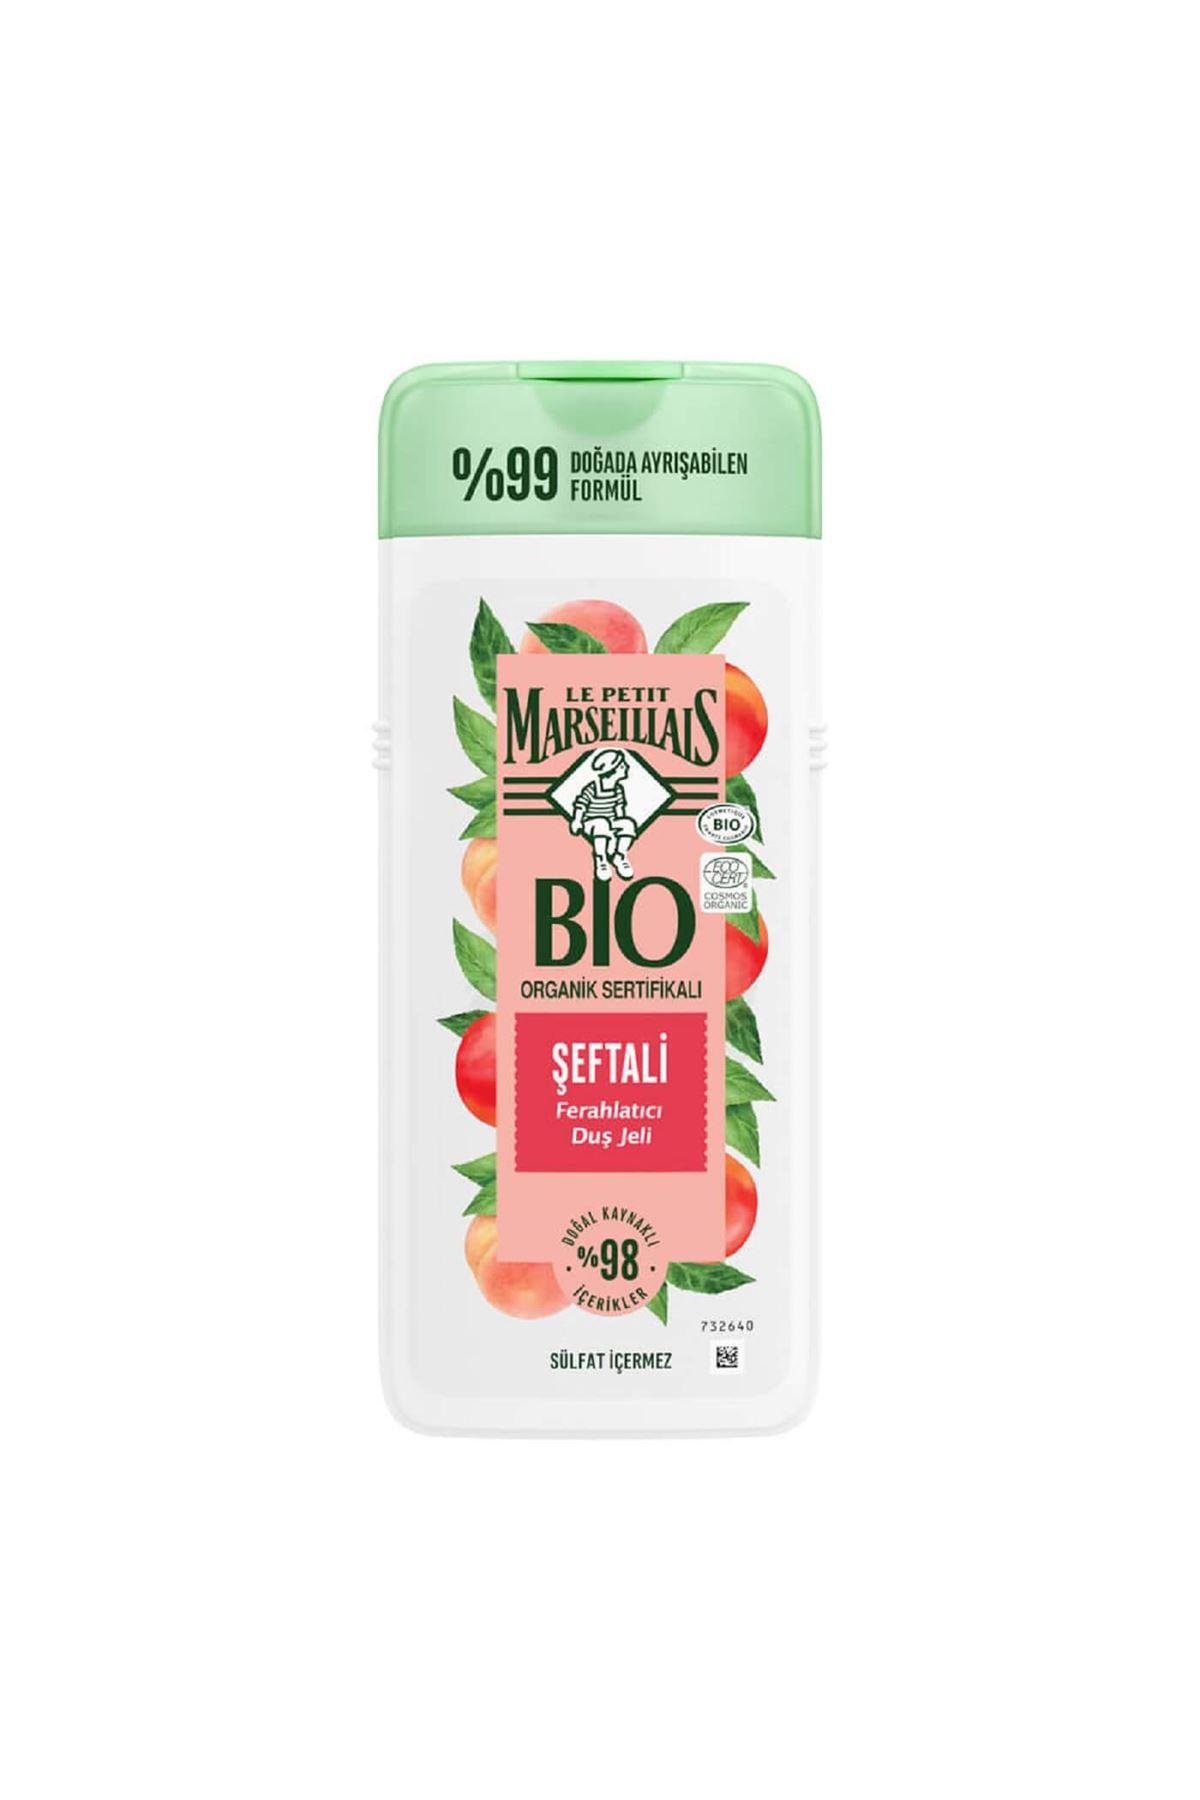 Le Petit Marseillais Bio Organic Sertifikalı Şeftali Duş Jeli 400ml